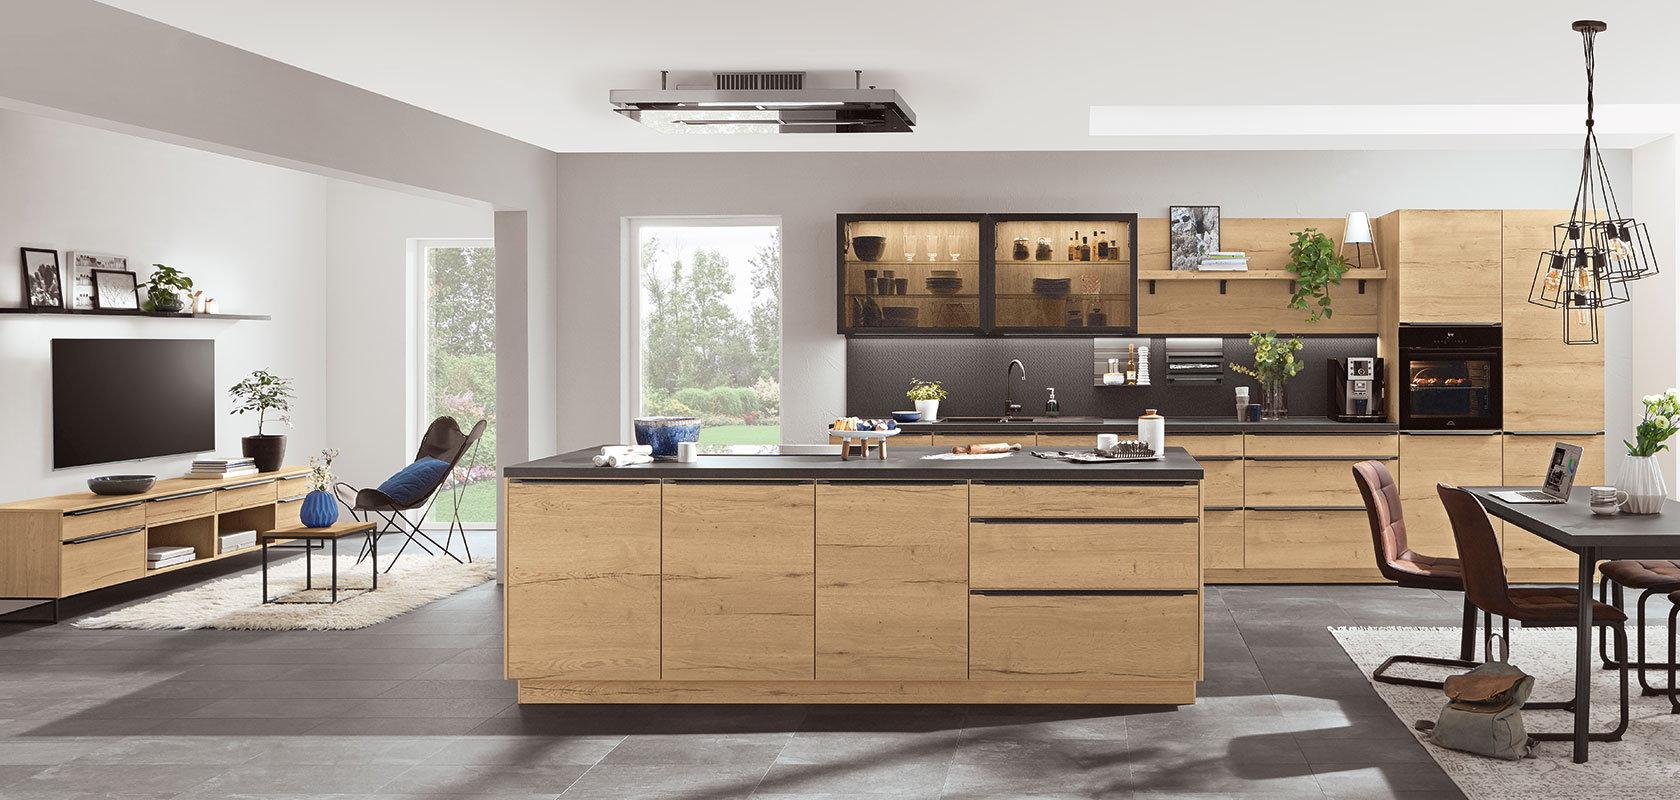 Thuiswerken aan de eetkamertafel – decor zwart beton keukenblad en tafelblad – Decor houten keuken Nobilia Structura 405